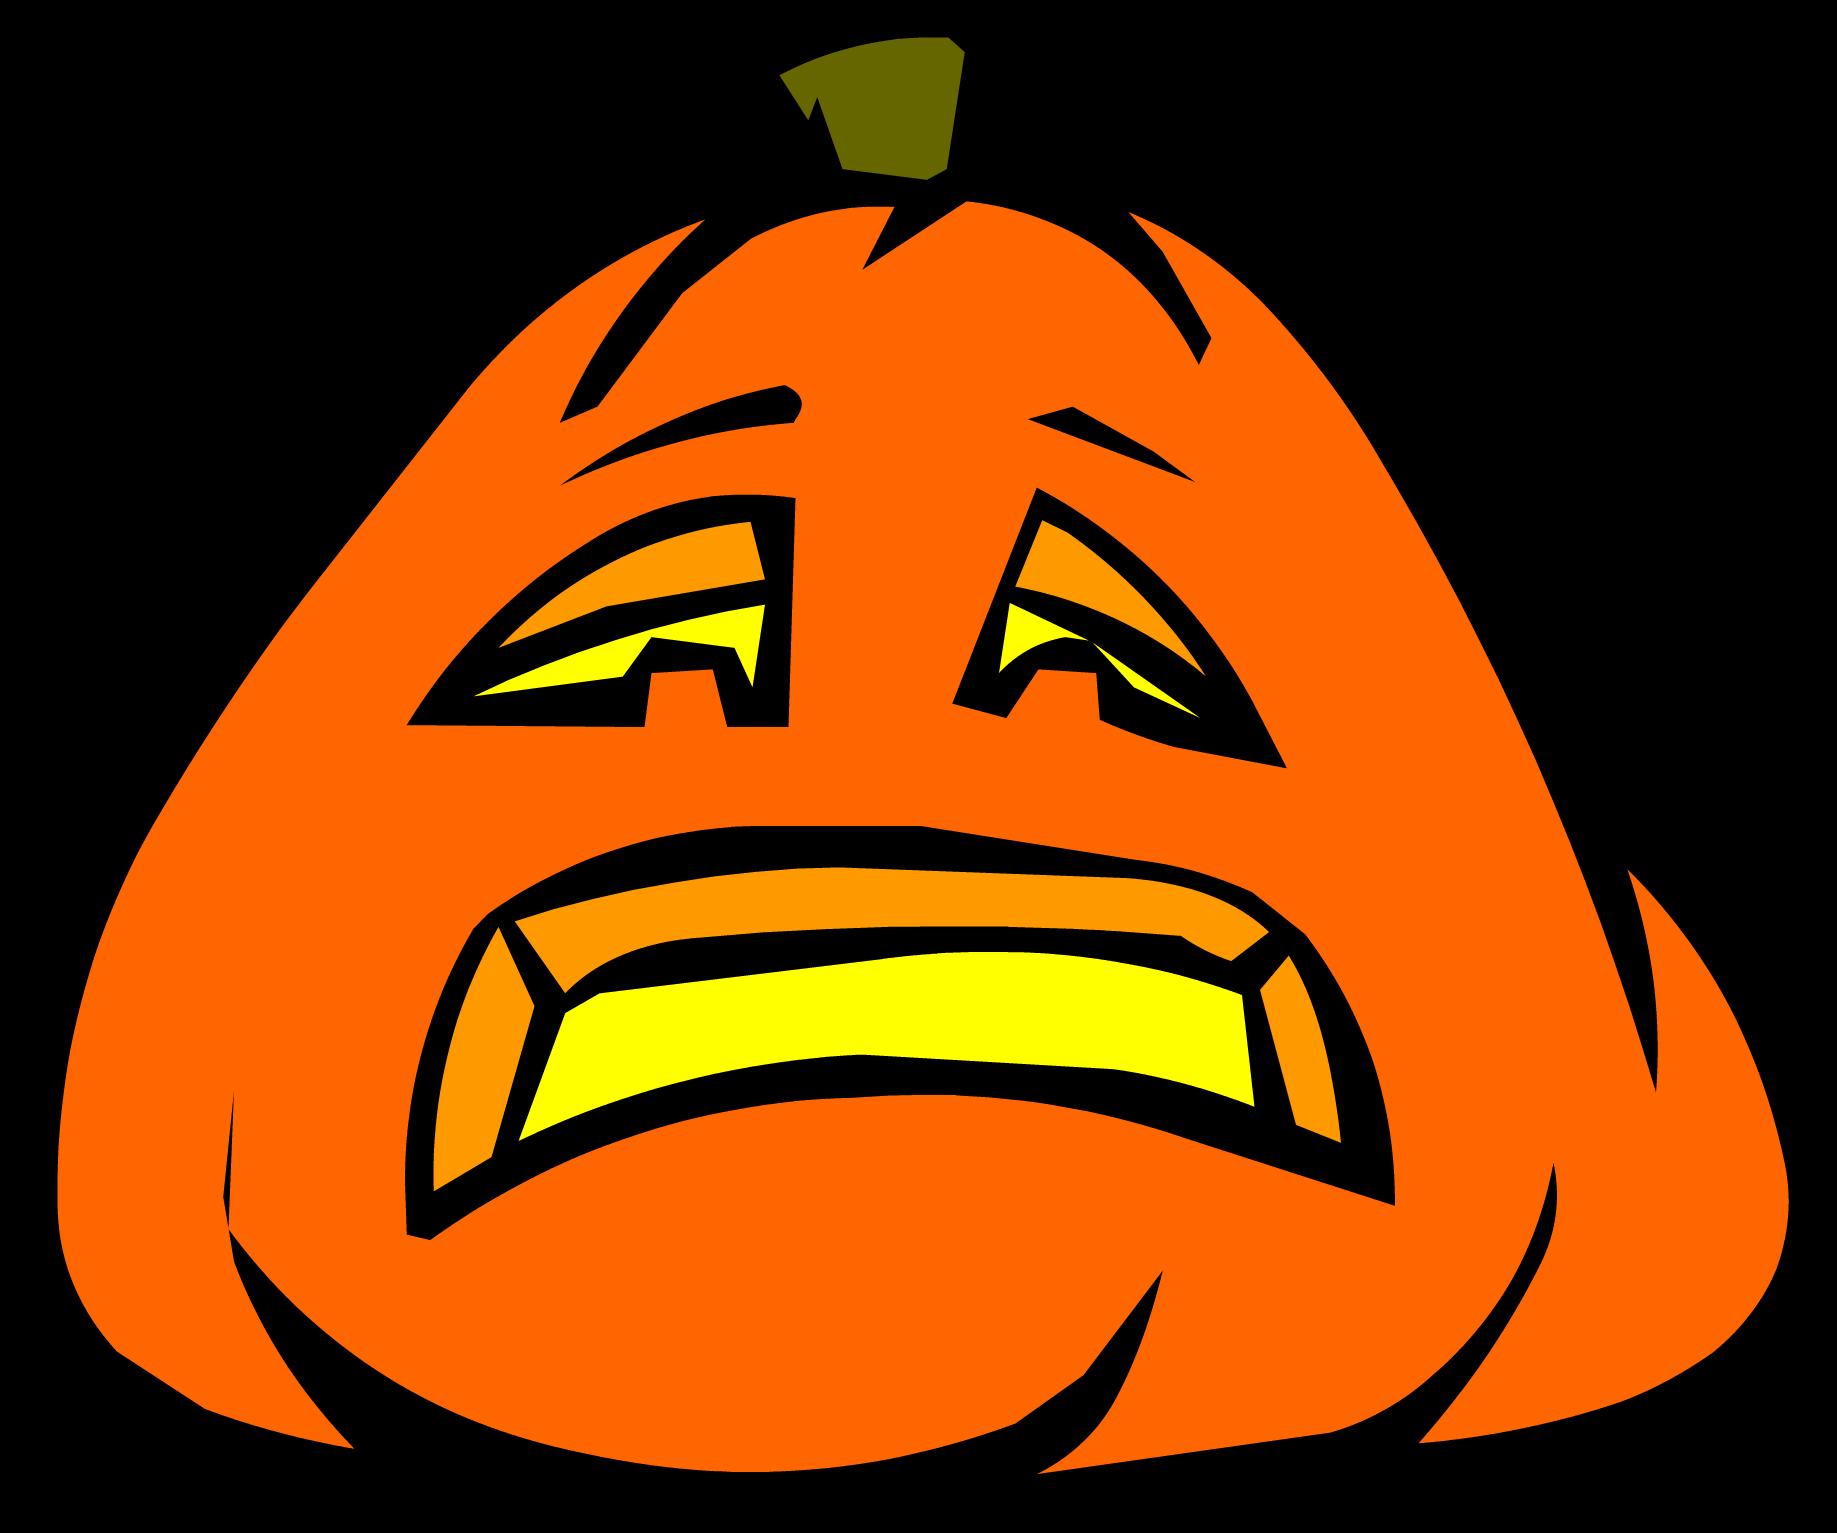 Image jack o lantern. Sad clipart pumpkin